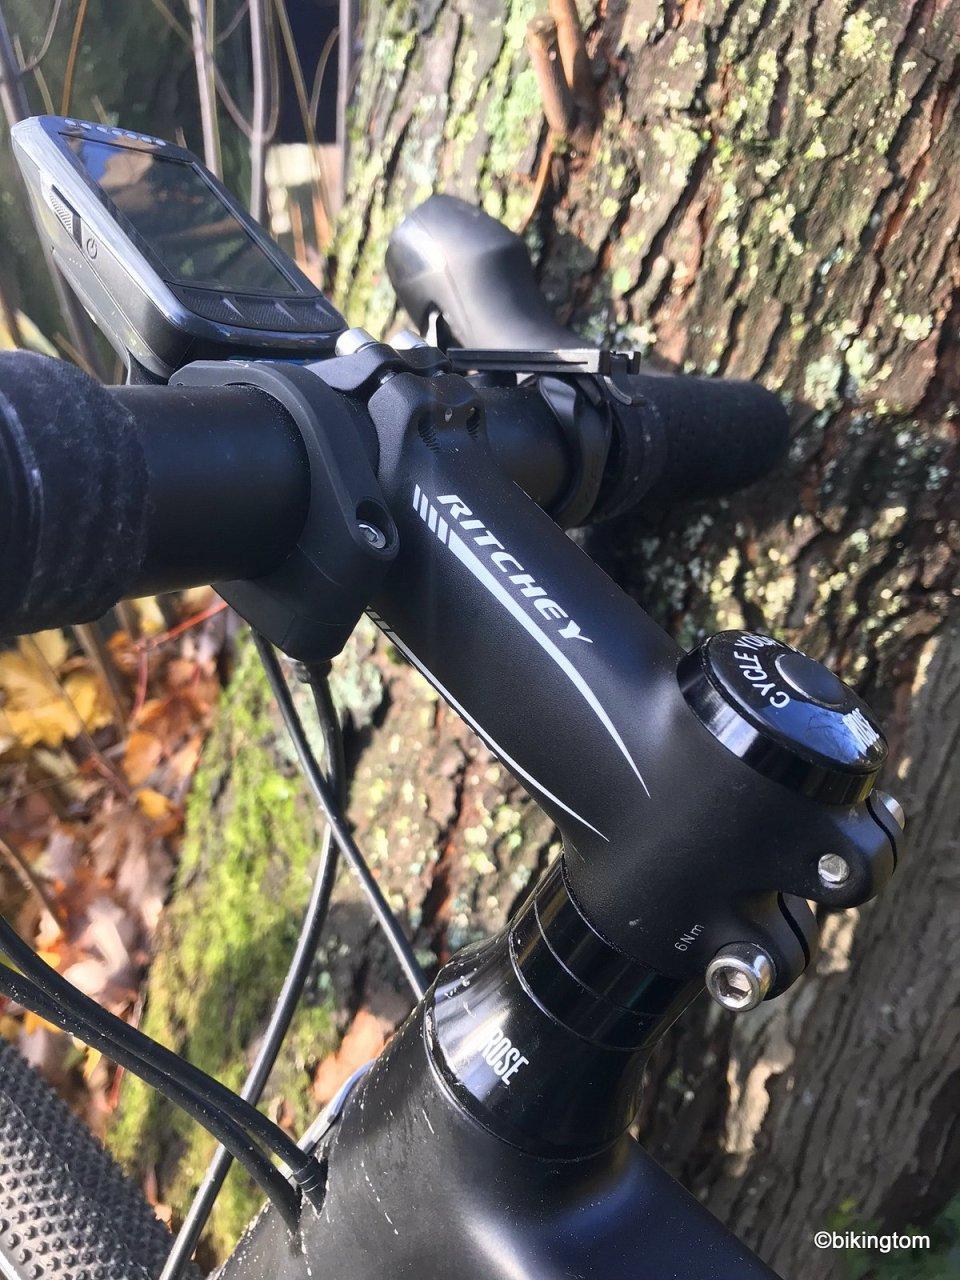 ROSEBIKES, bikingtom, Fahrrad Test, Fahrrad,Crossbike